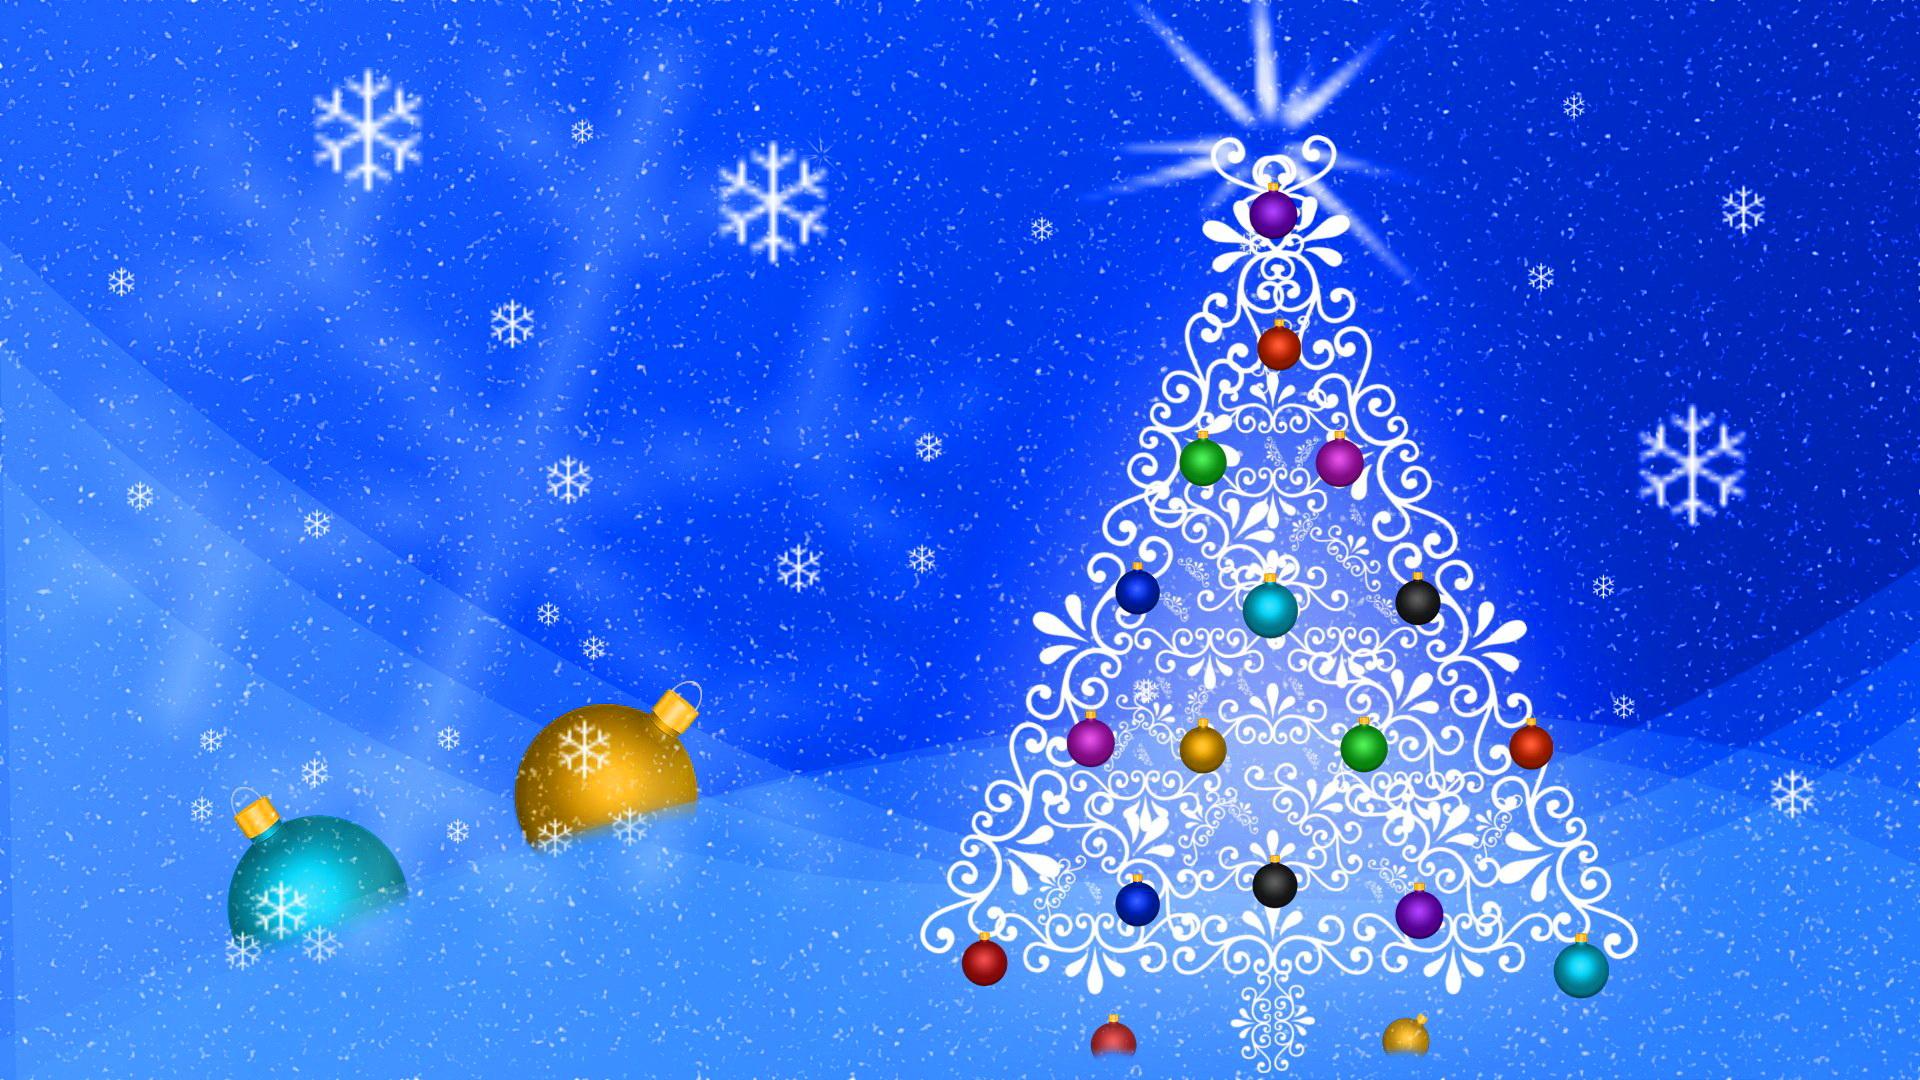 40 Christmas Tree Wallpapers For 2015